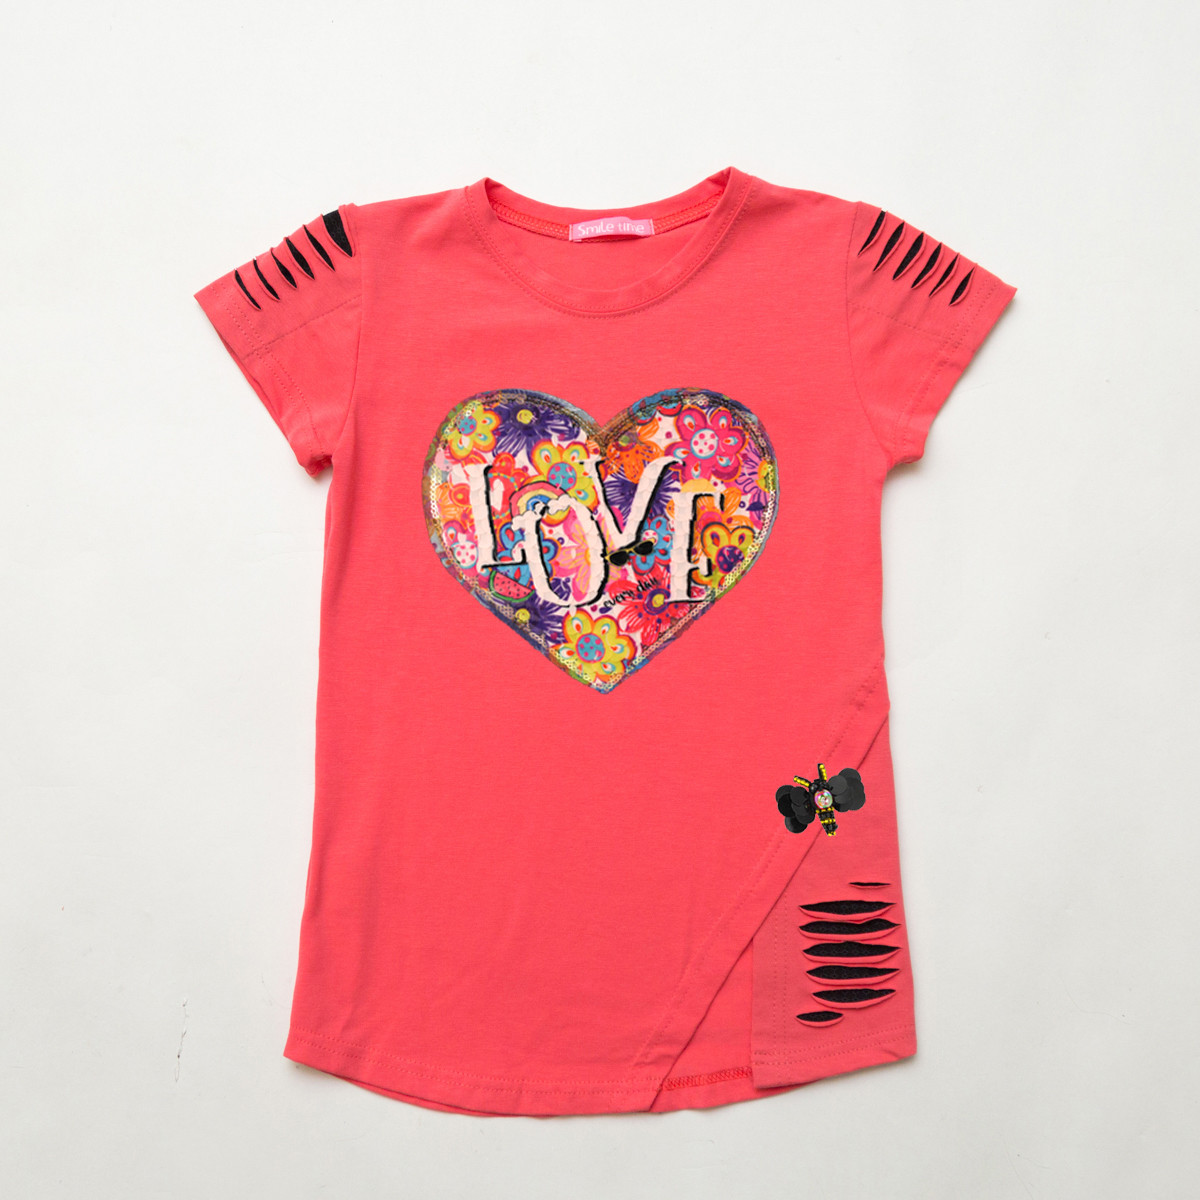 Модная футболка для девочки р.134 SmileTime с уголком Lovely, коралл